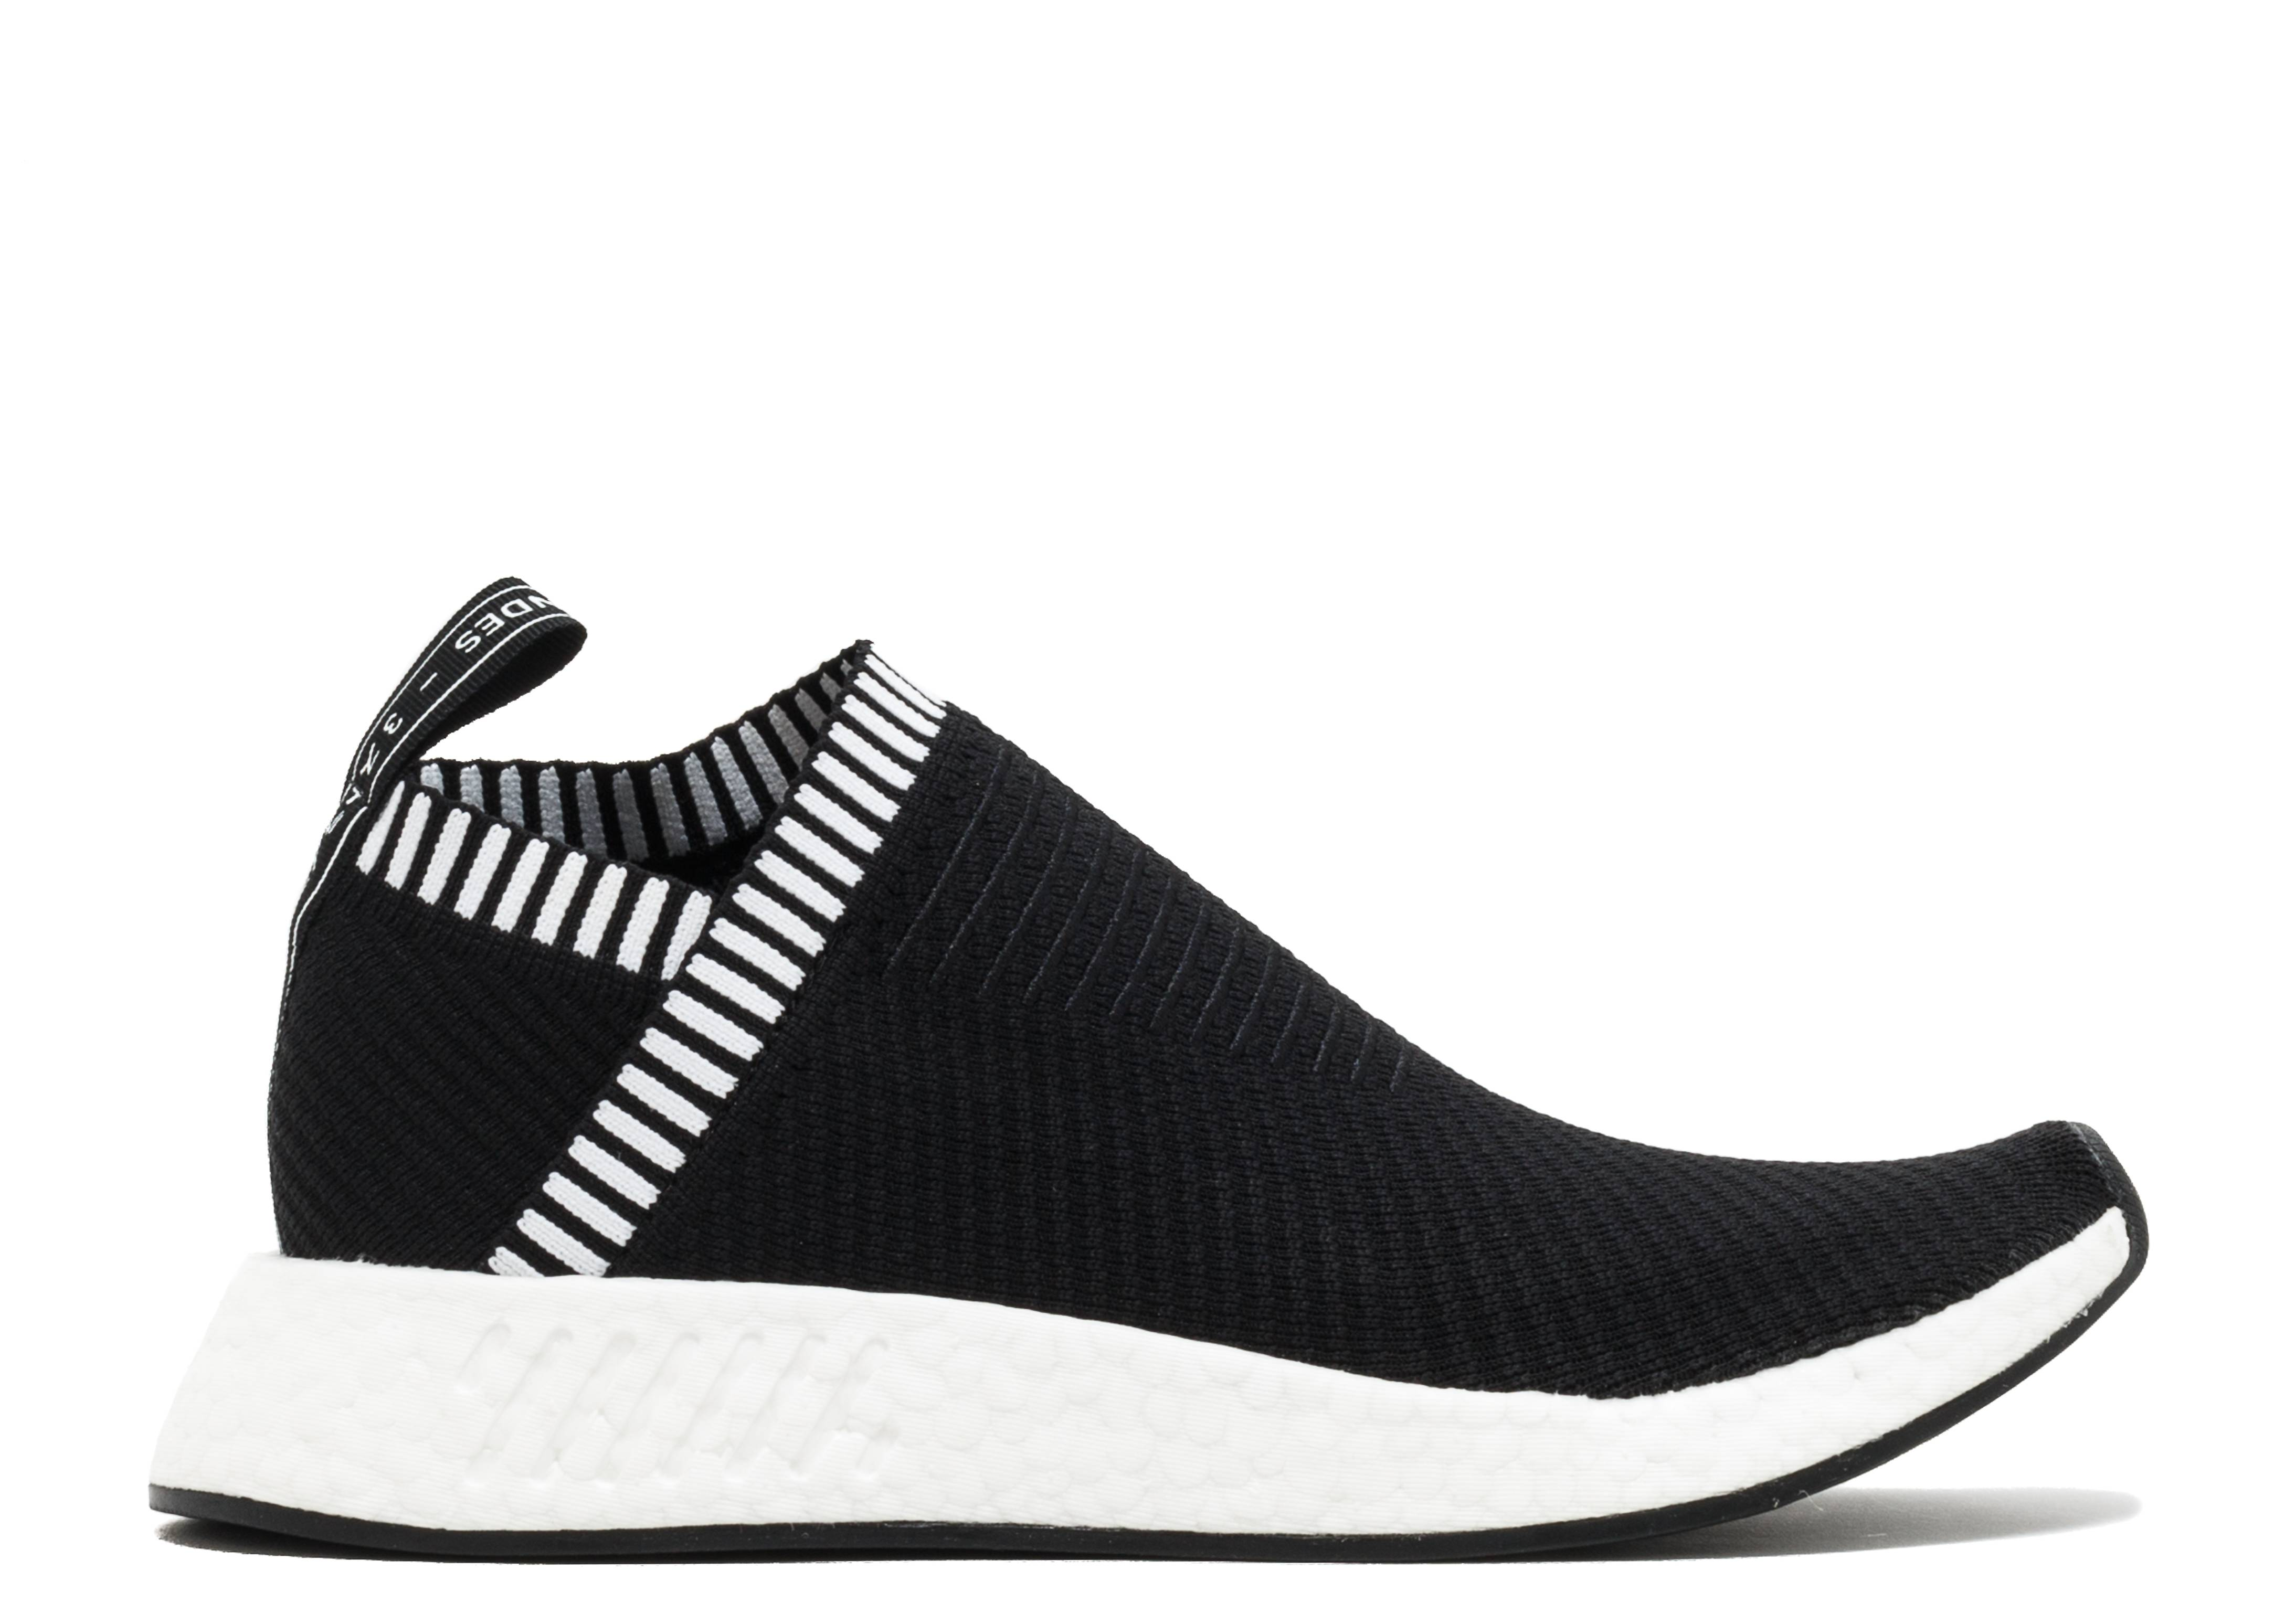 adidas NMD CS2 City Sock 2